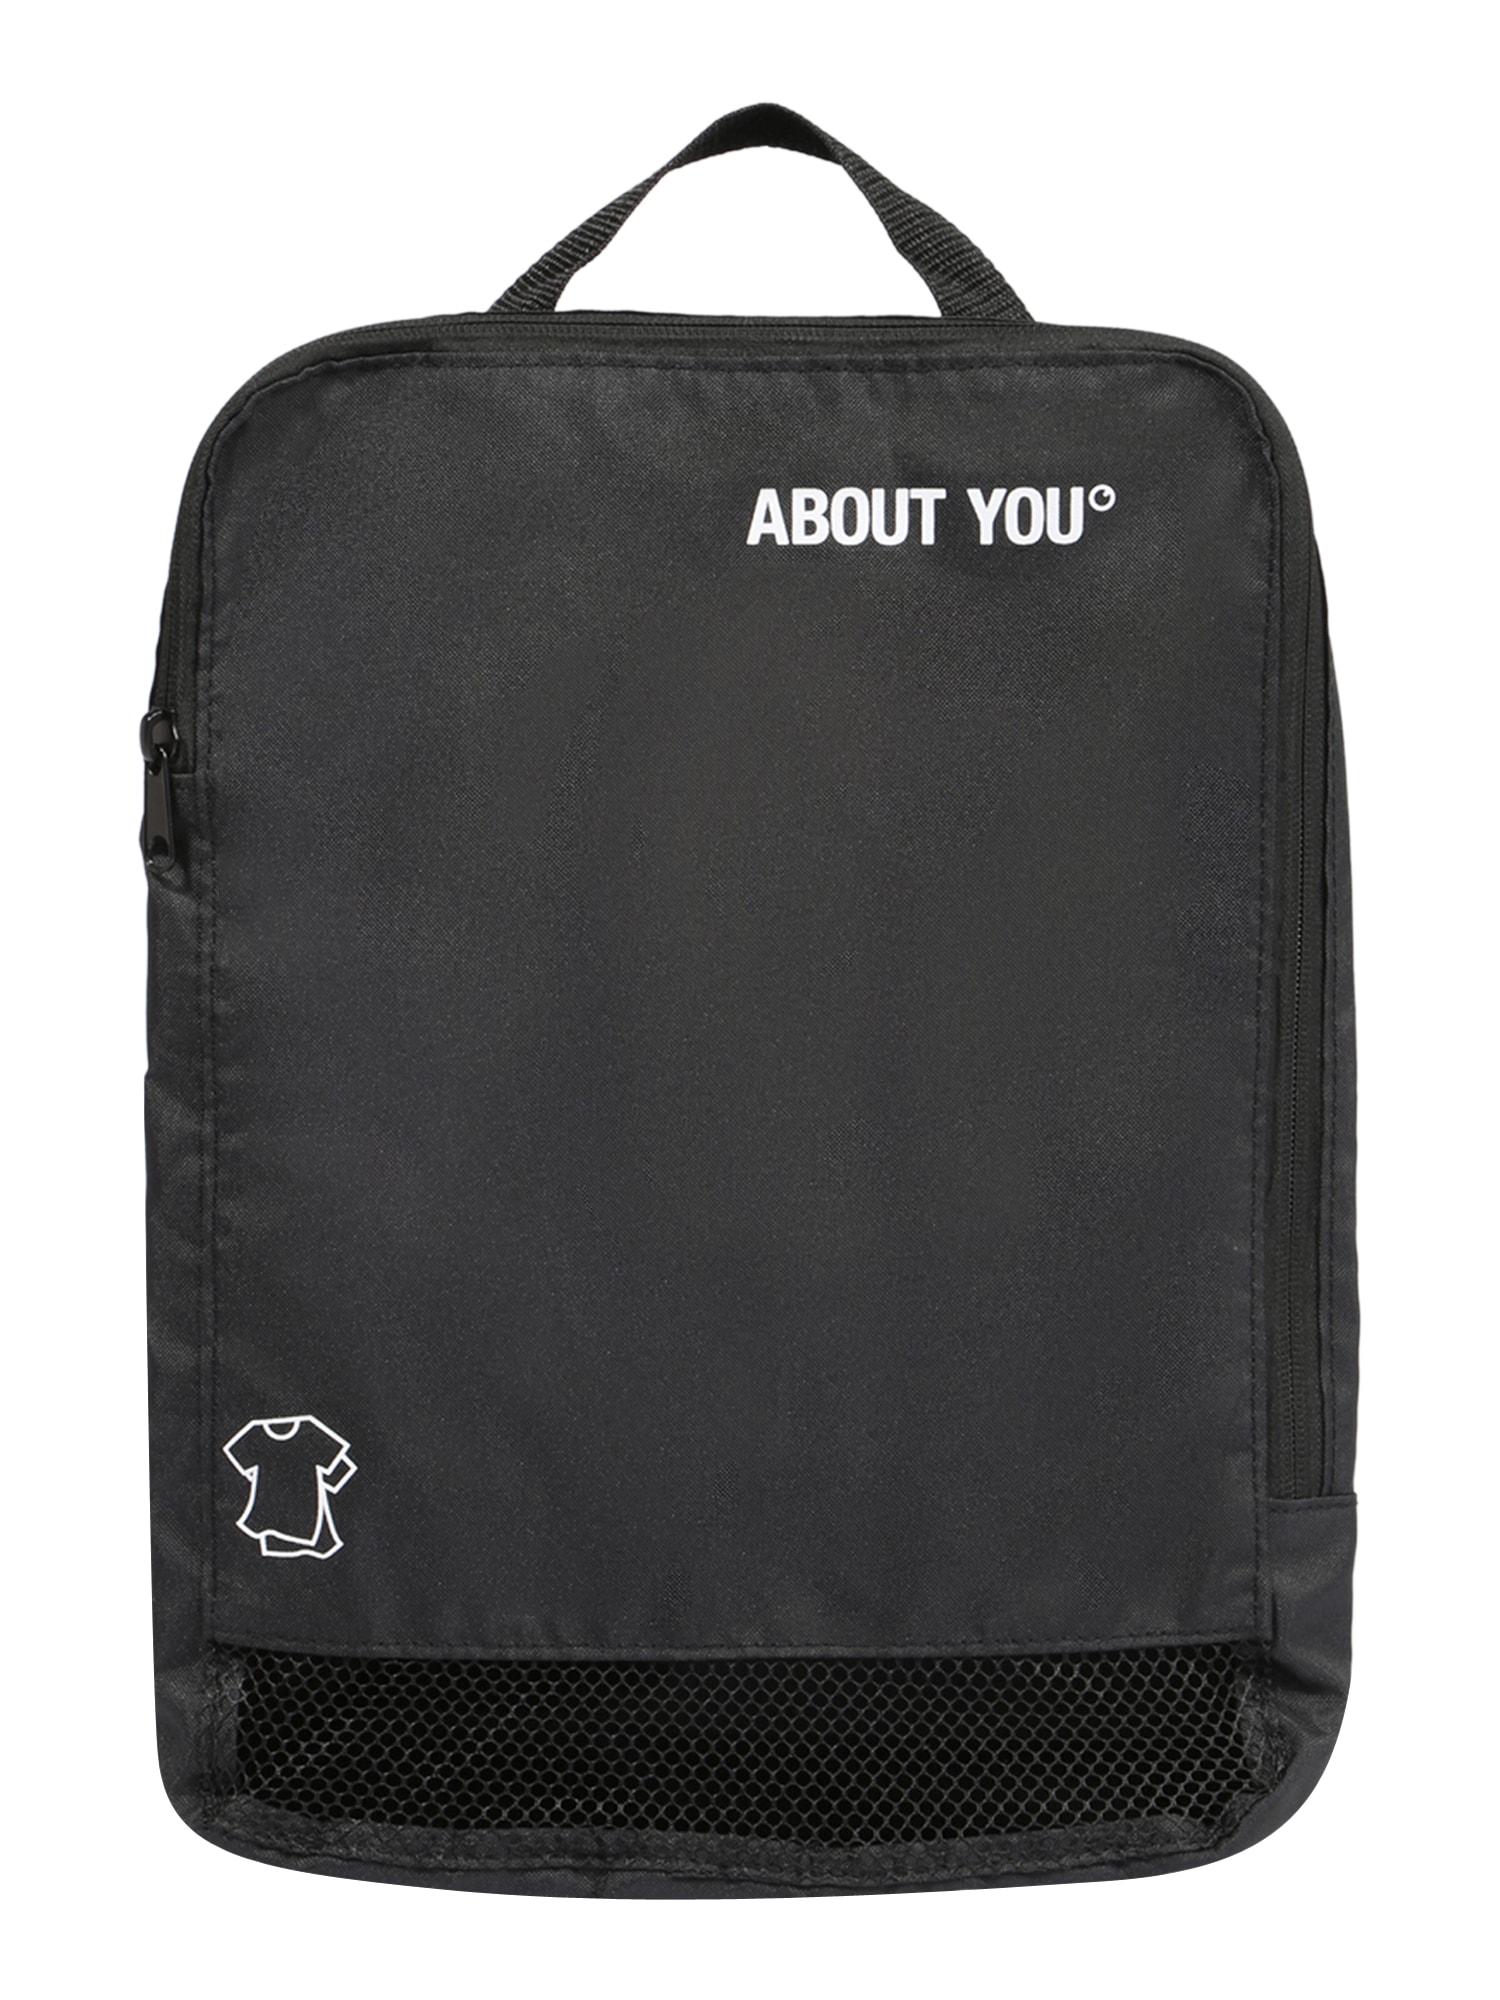 ABOUT YOU Kelioninis krepšys juoda